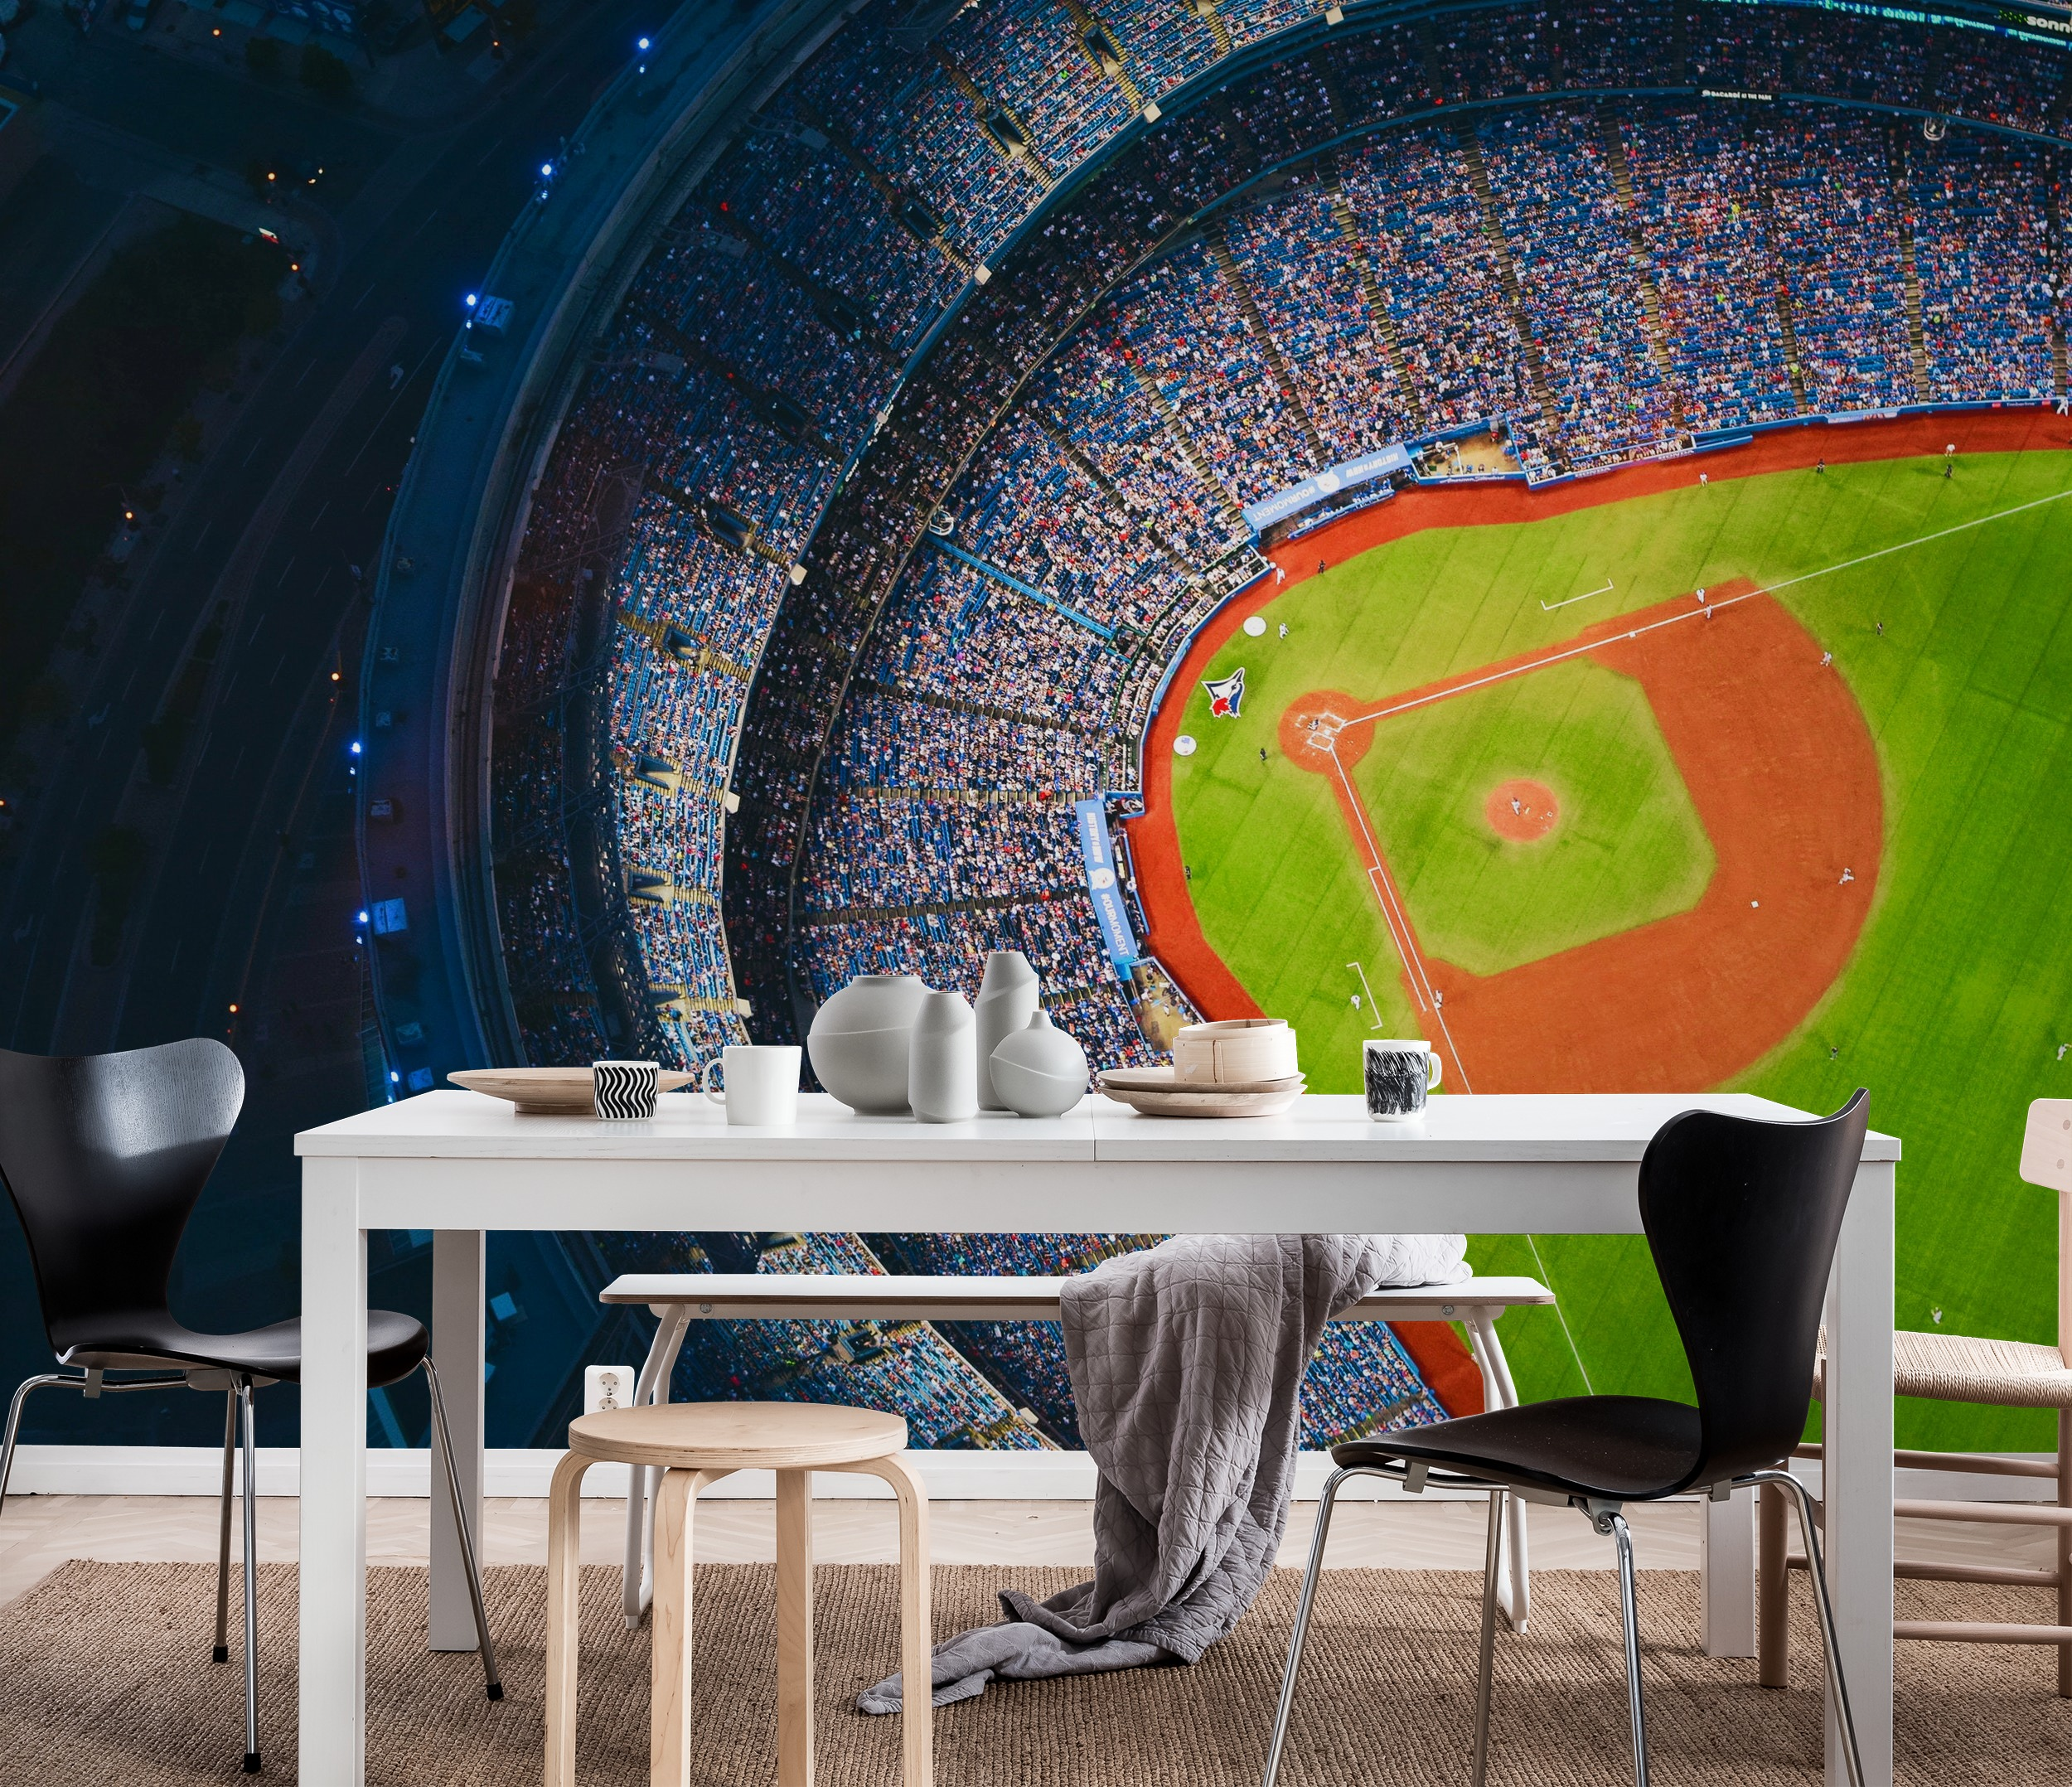 Wall mural baseball photo wallpaper happywall for Baseball mural wallpaper